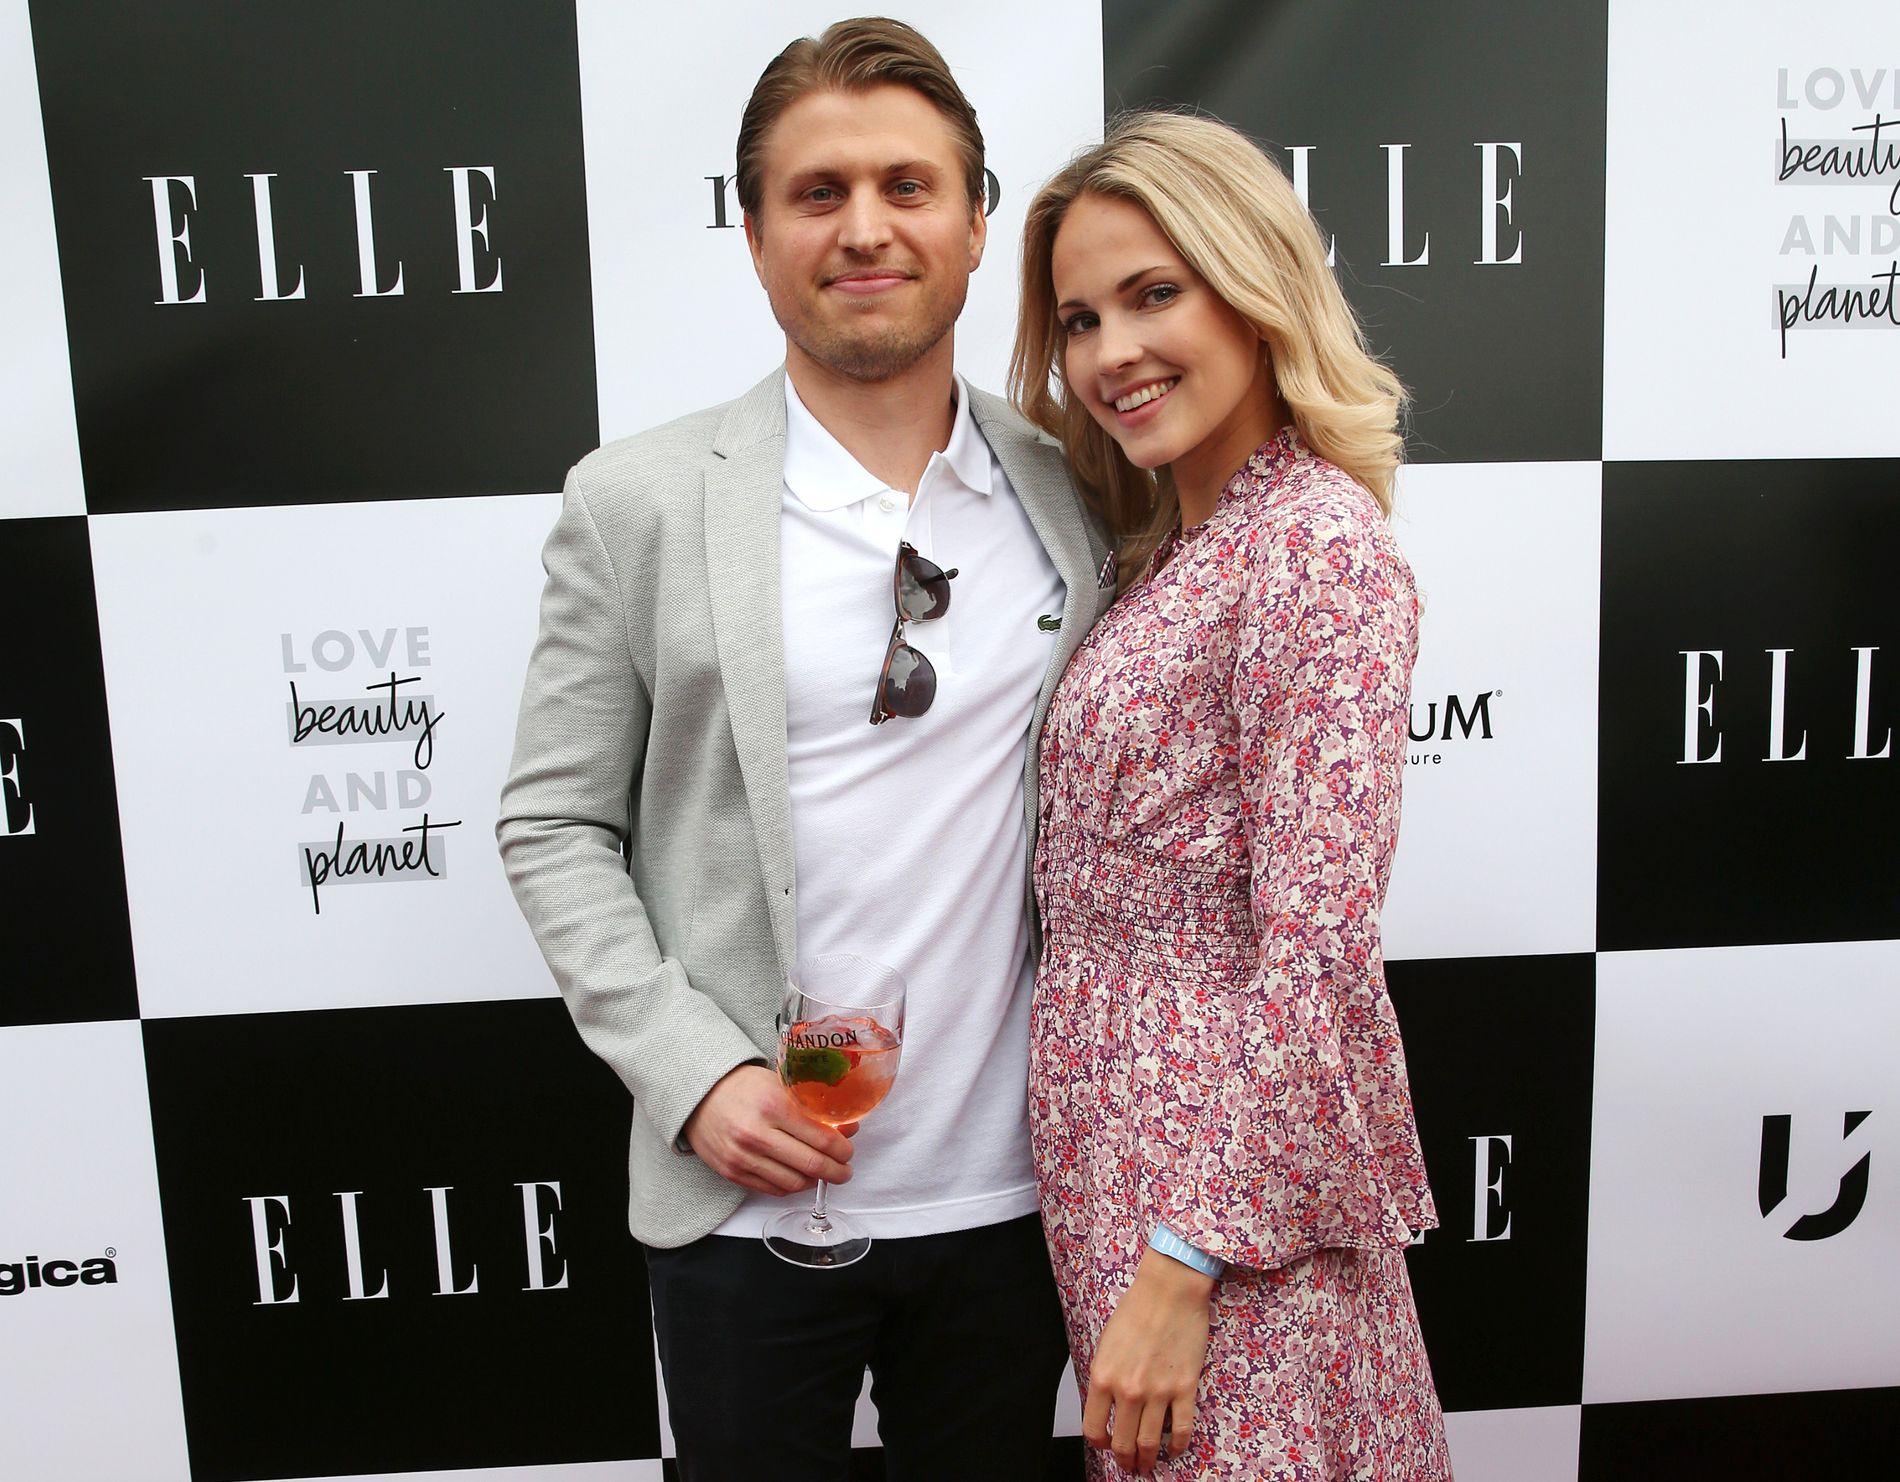 Emilie «Voe» Nereng med samboer og nå forlovede Torgeir Glomnes Johansen på Elle-festen i juni.